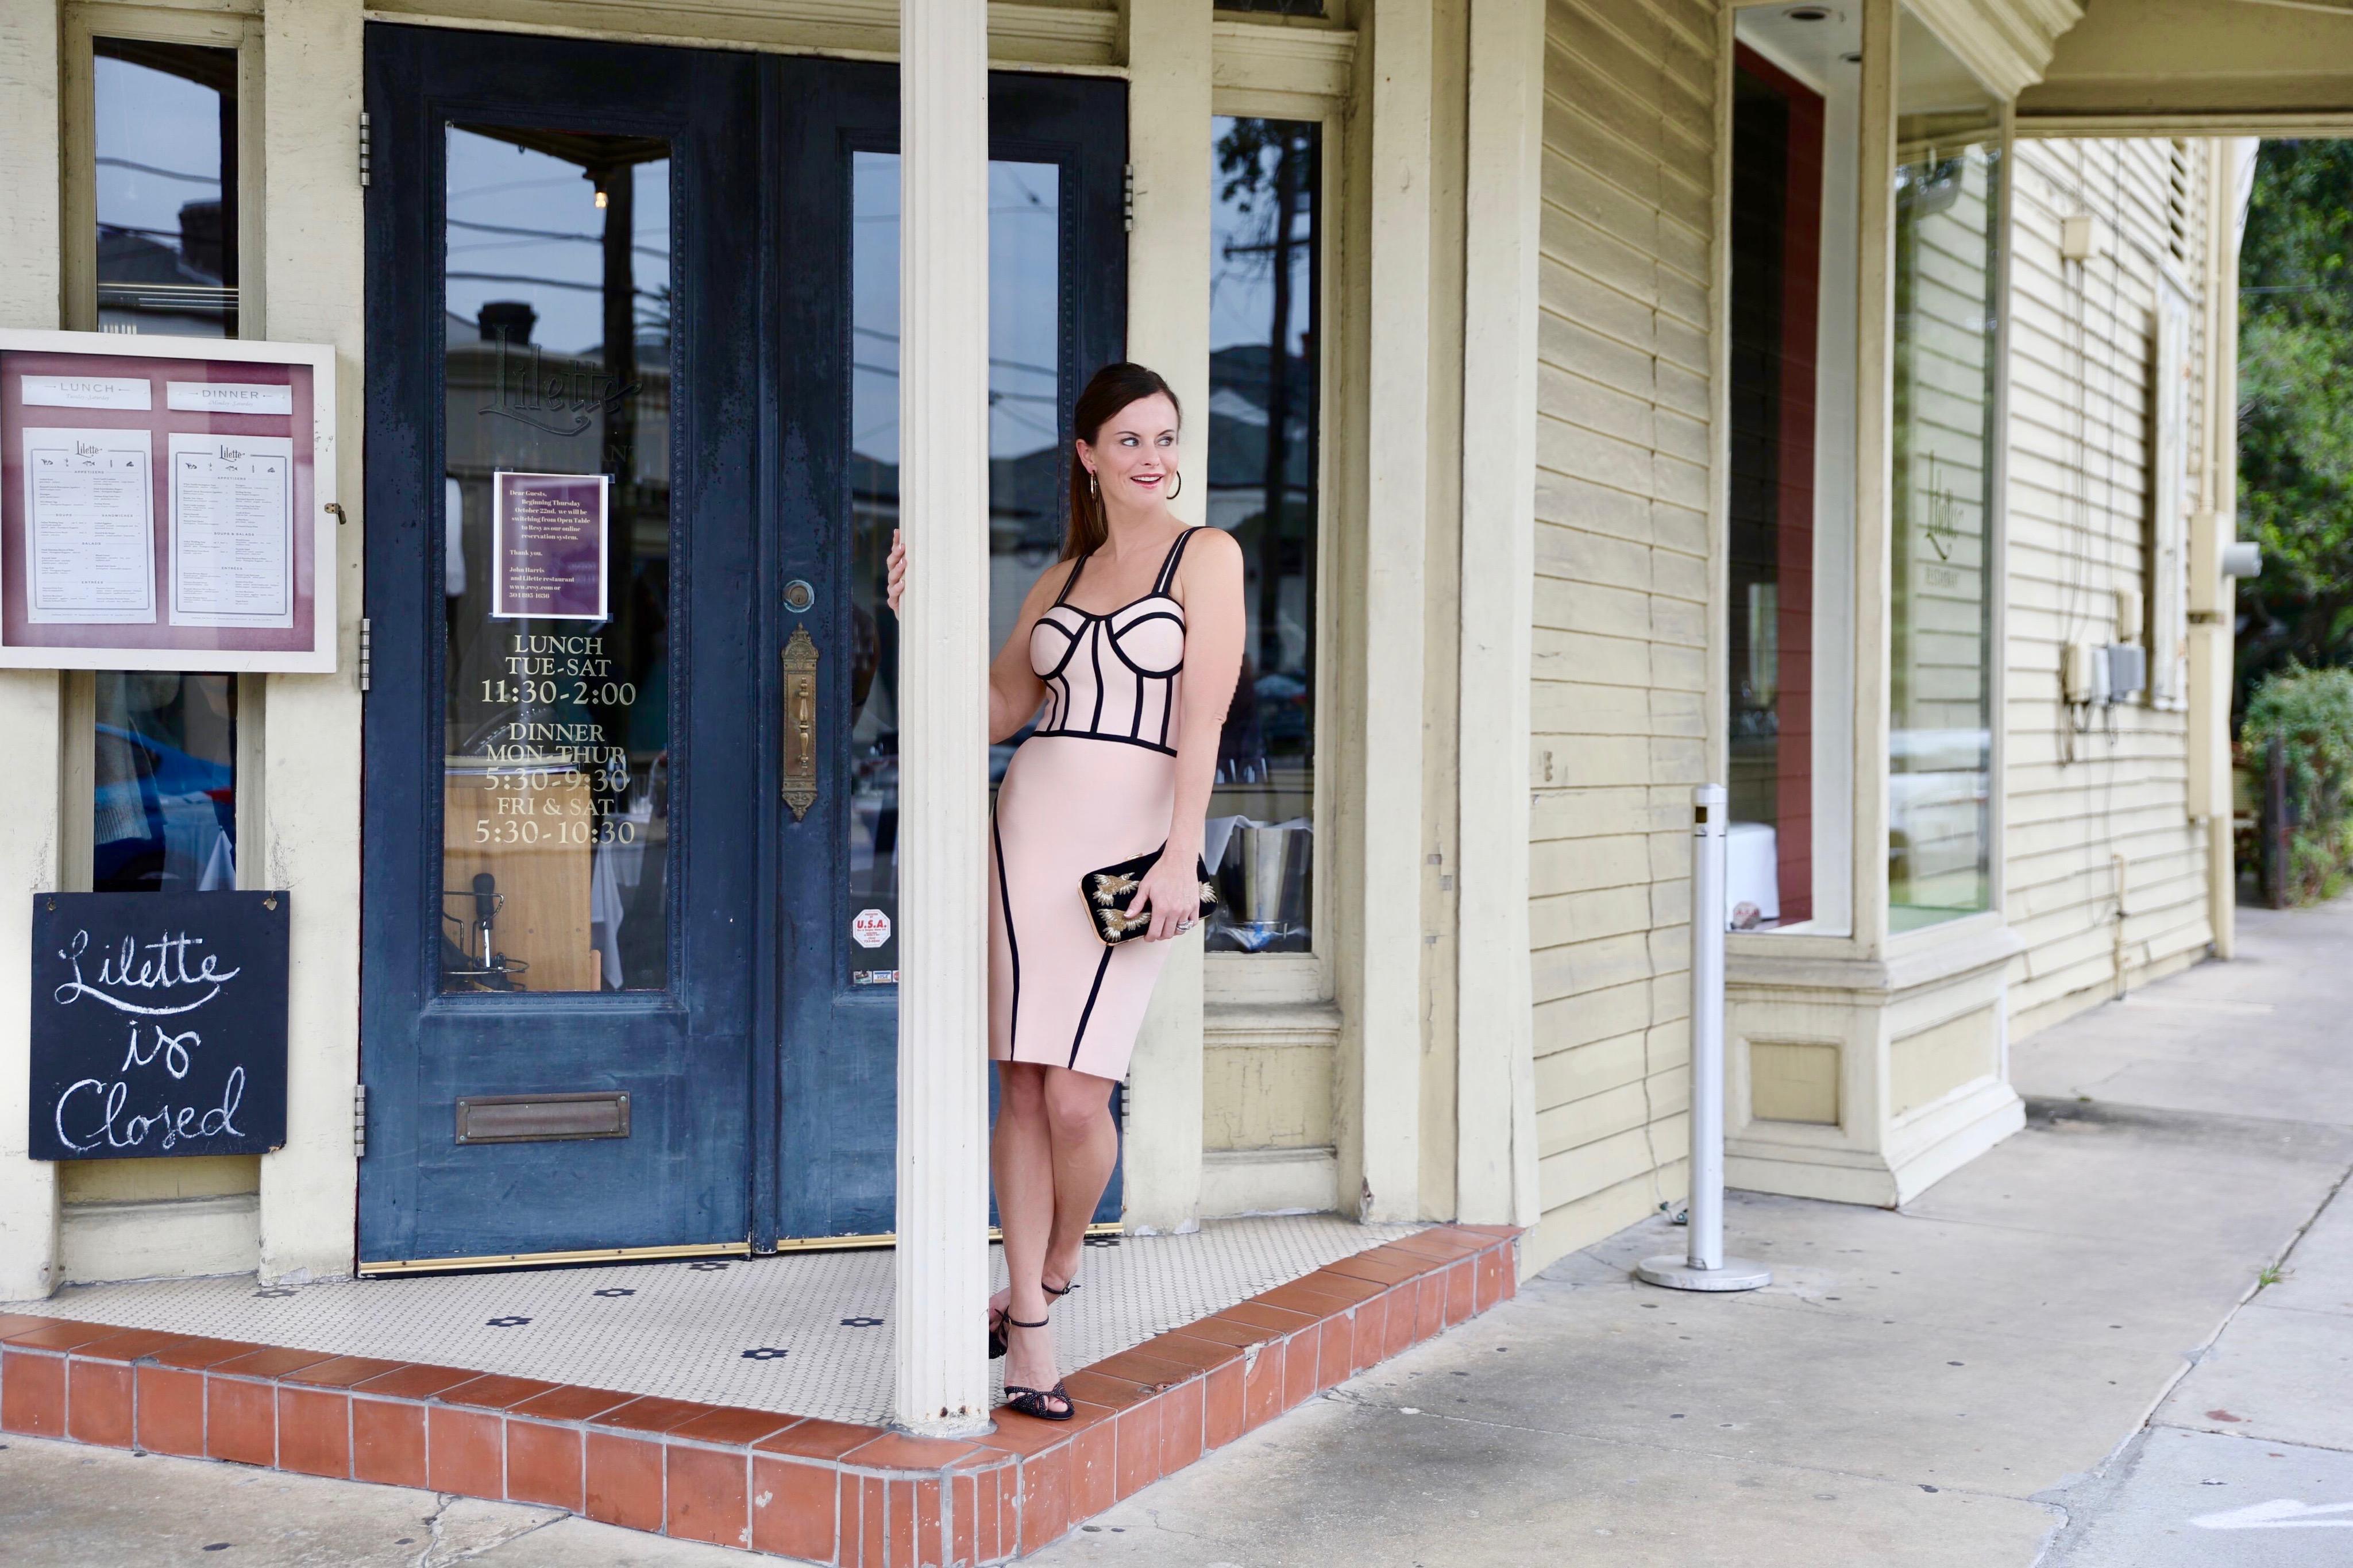 KF Design | Life | Style Cocktail Dresses Under $125